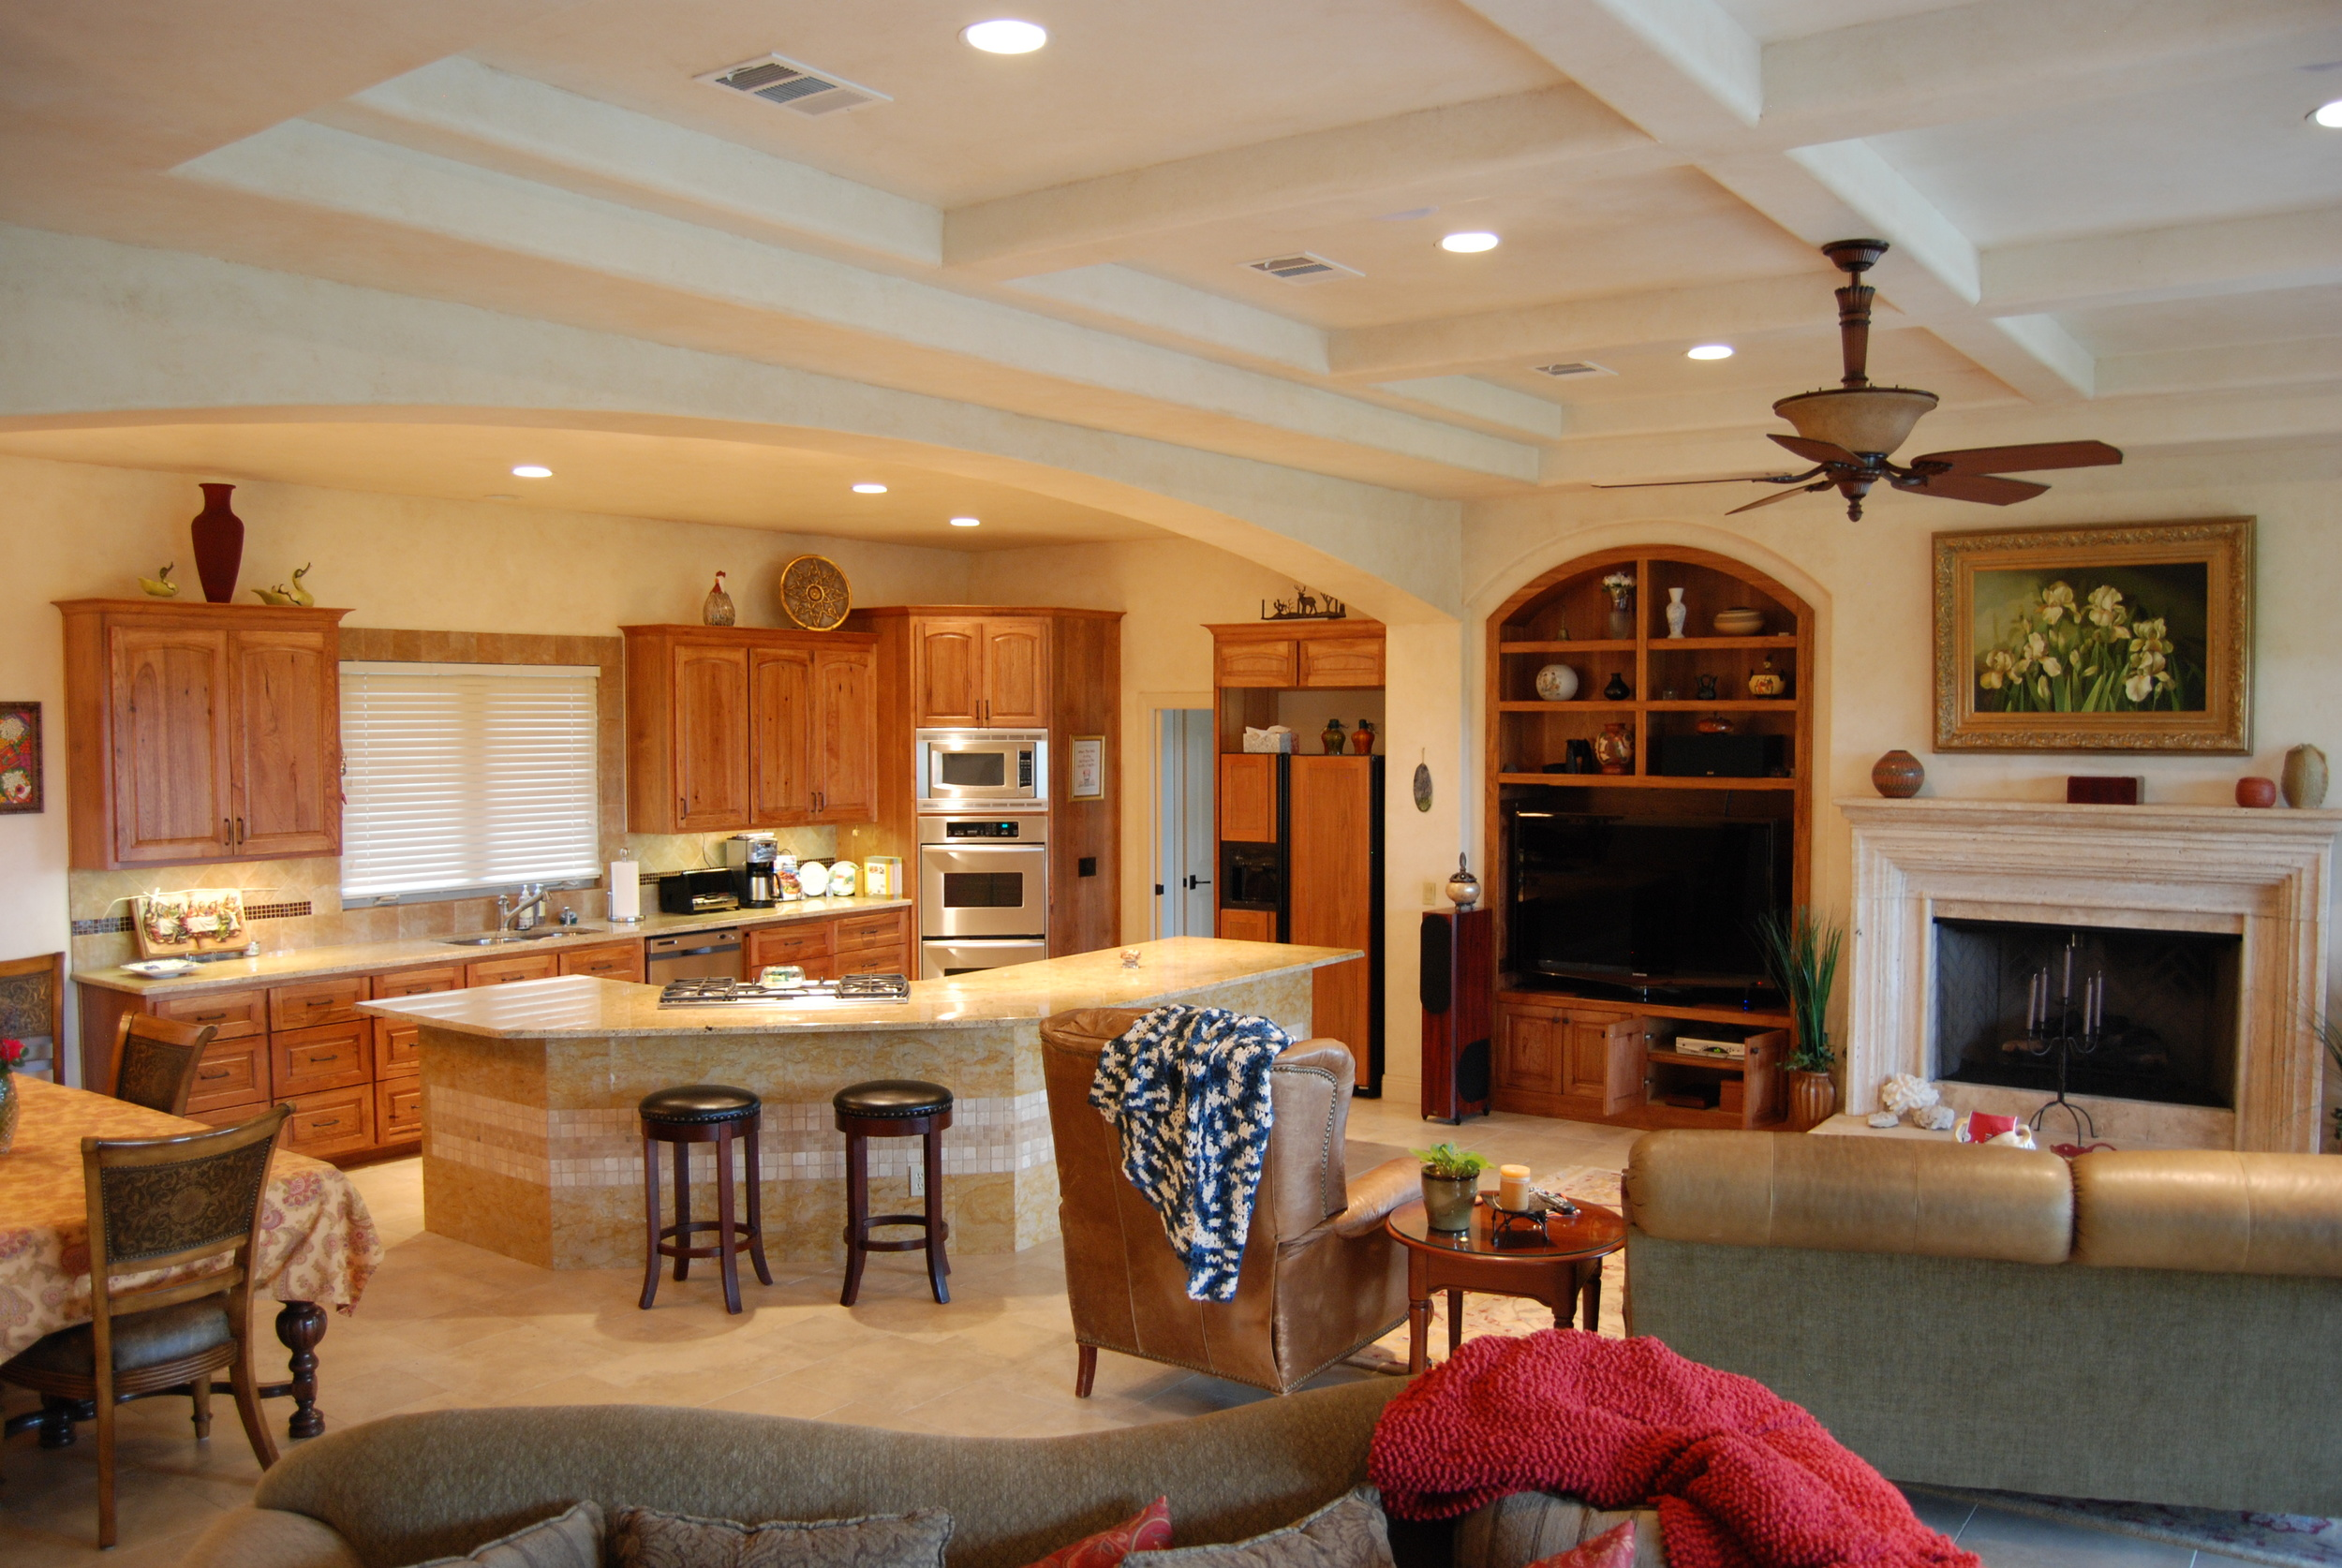 kitchens006.jpg